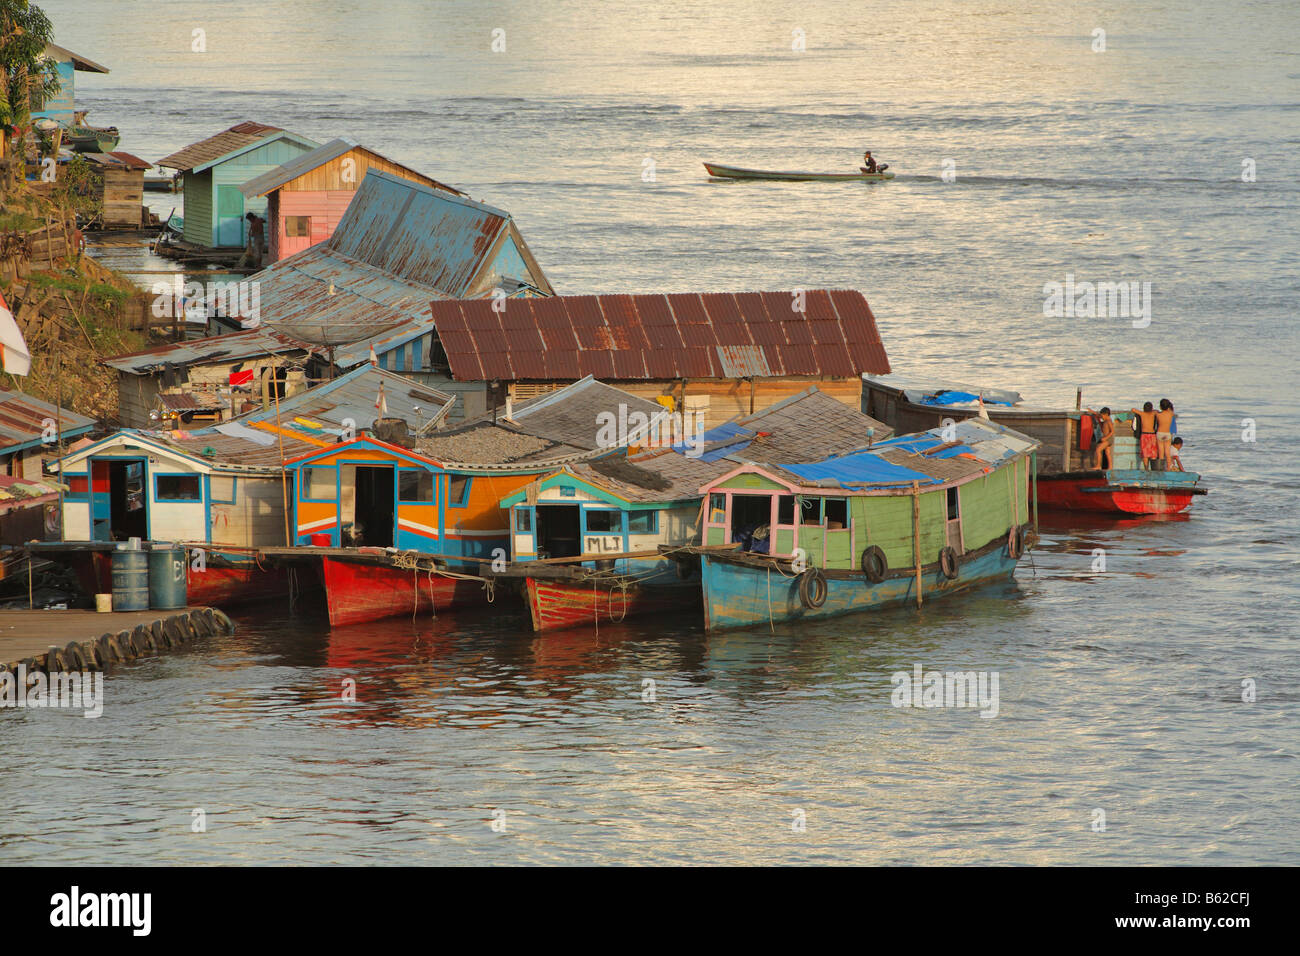 Houseboats, landing stage, Sungai Kapuas River, Putussibau, West Kalimantan, Borneo, Indonesia, Asia - Stock Image